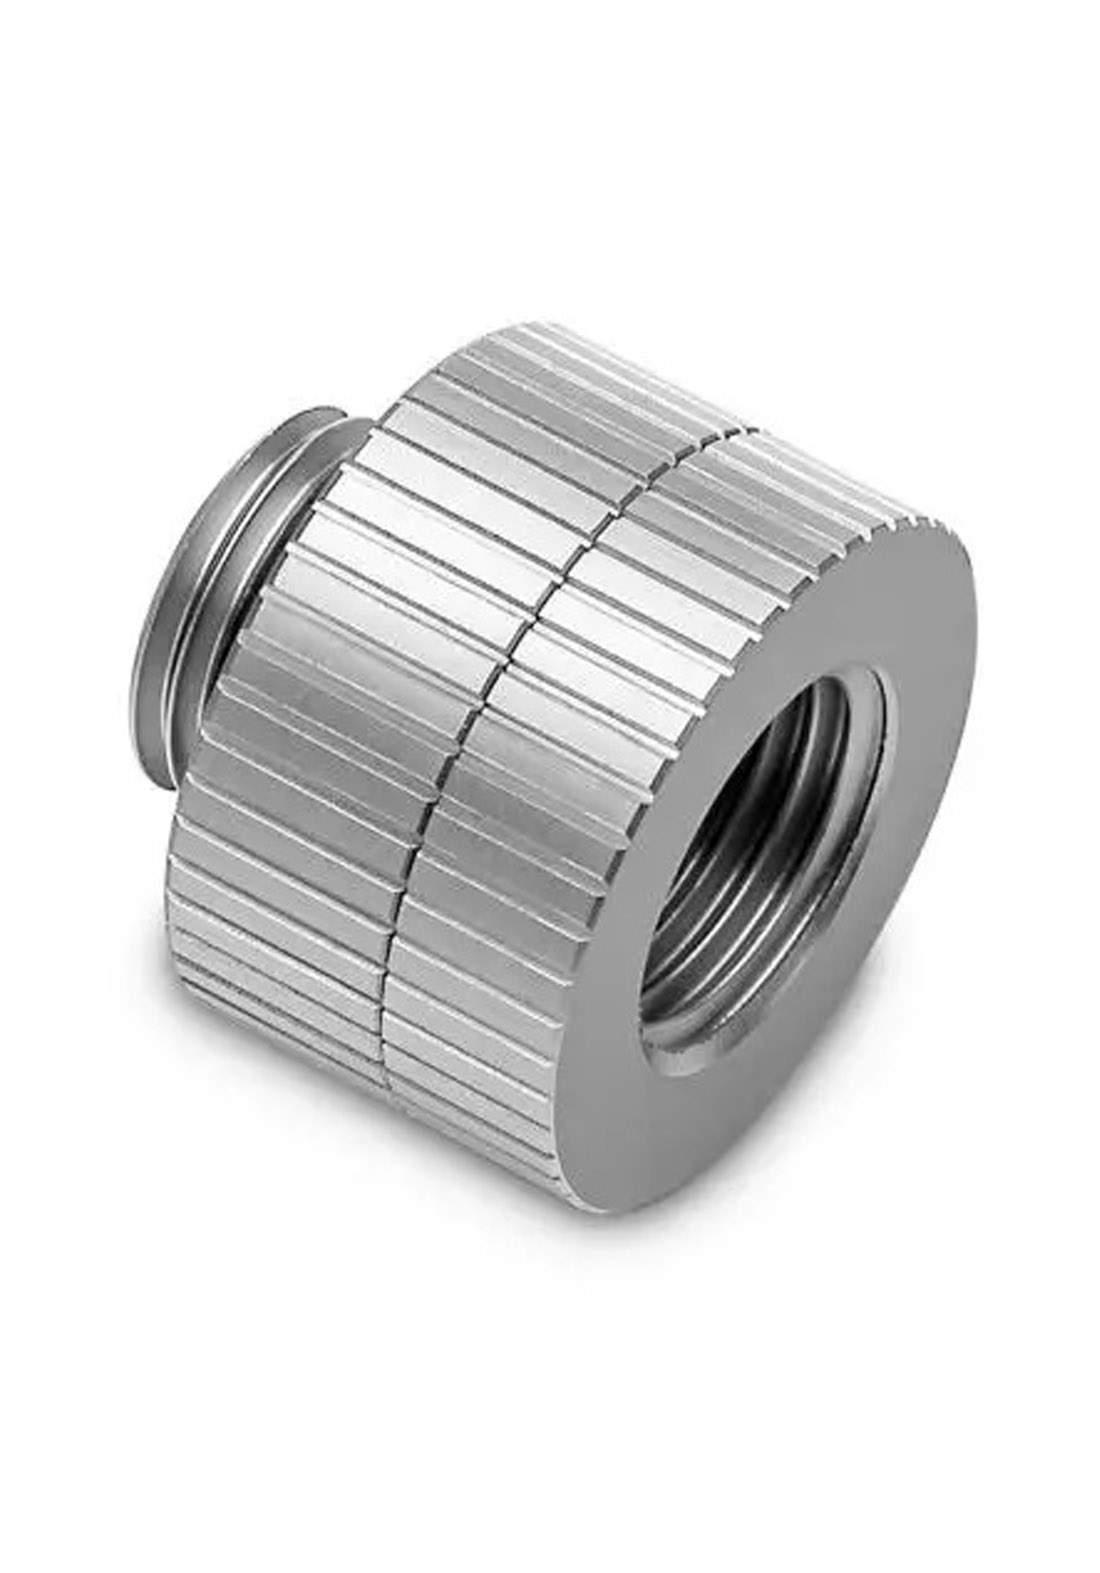 EK-Quantum Torque Extender Rotary MF 14 - Silver